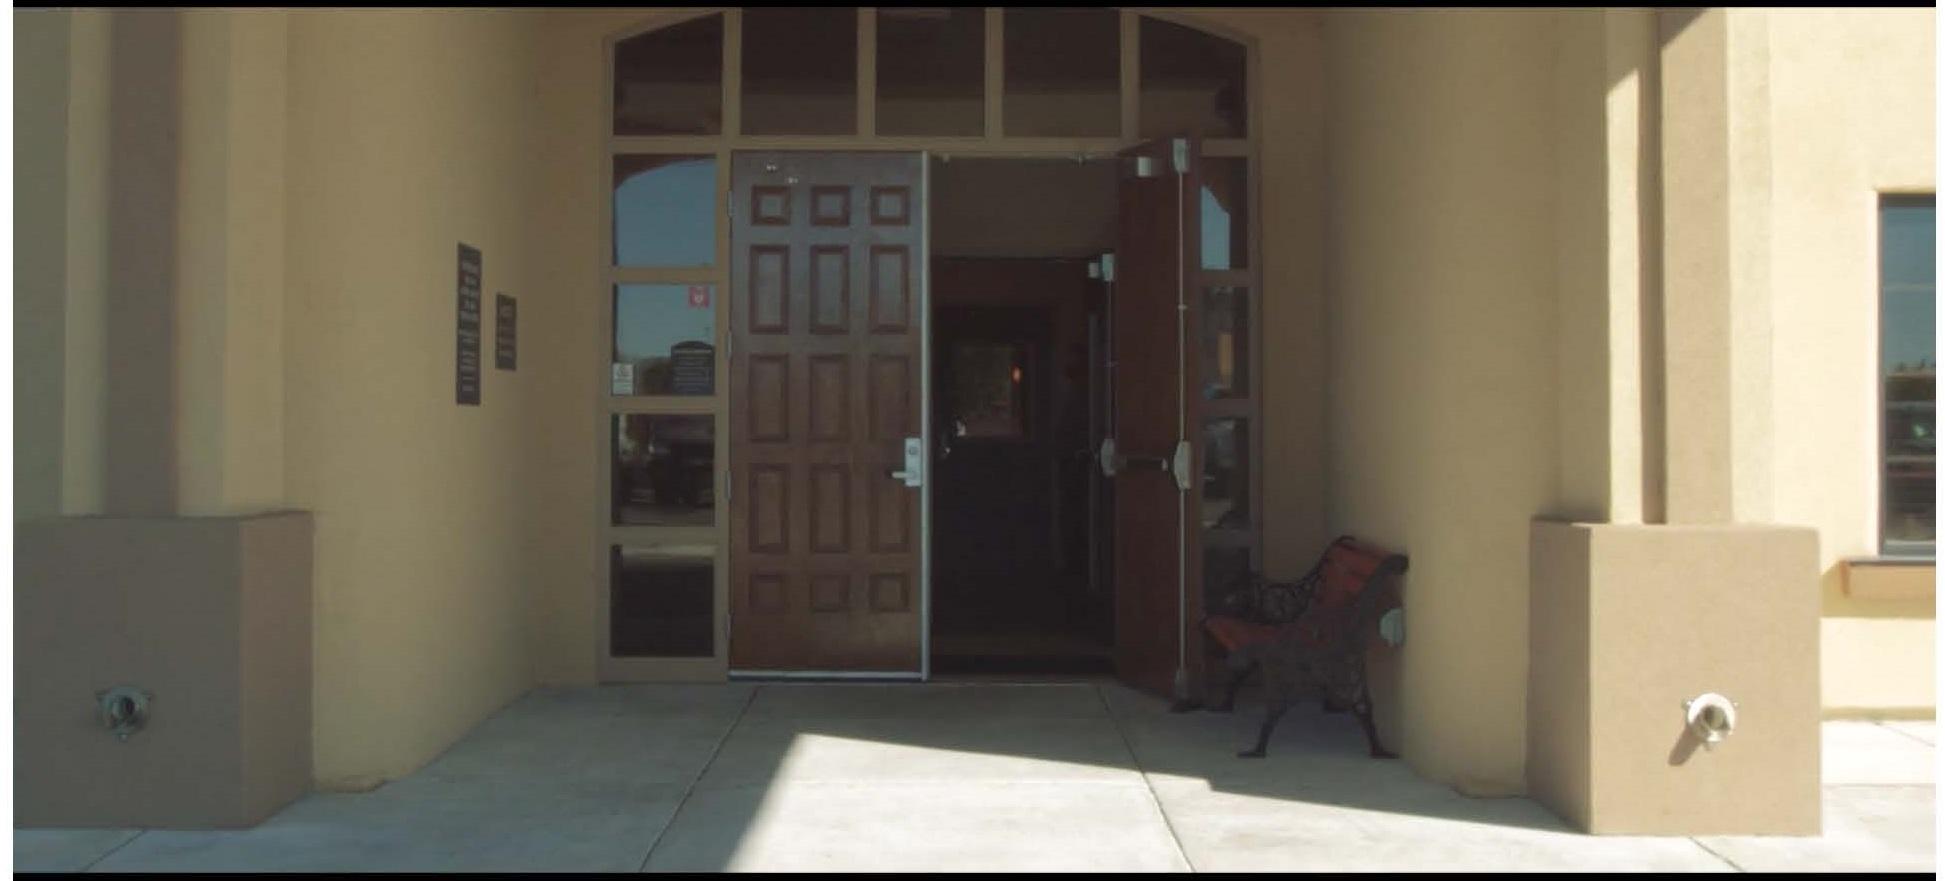 Mentis Neuro - El Paso Location Virtual Tour-HD on Vimeo4